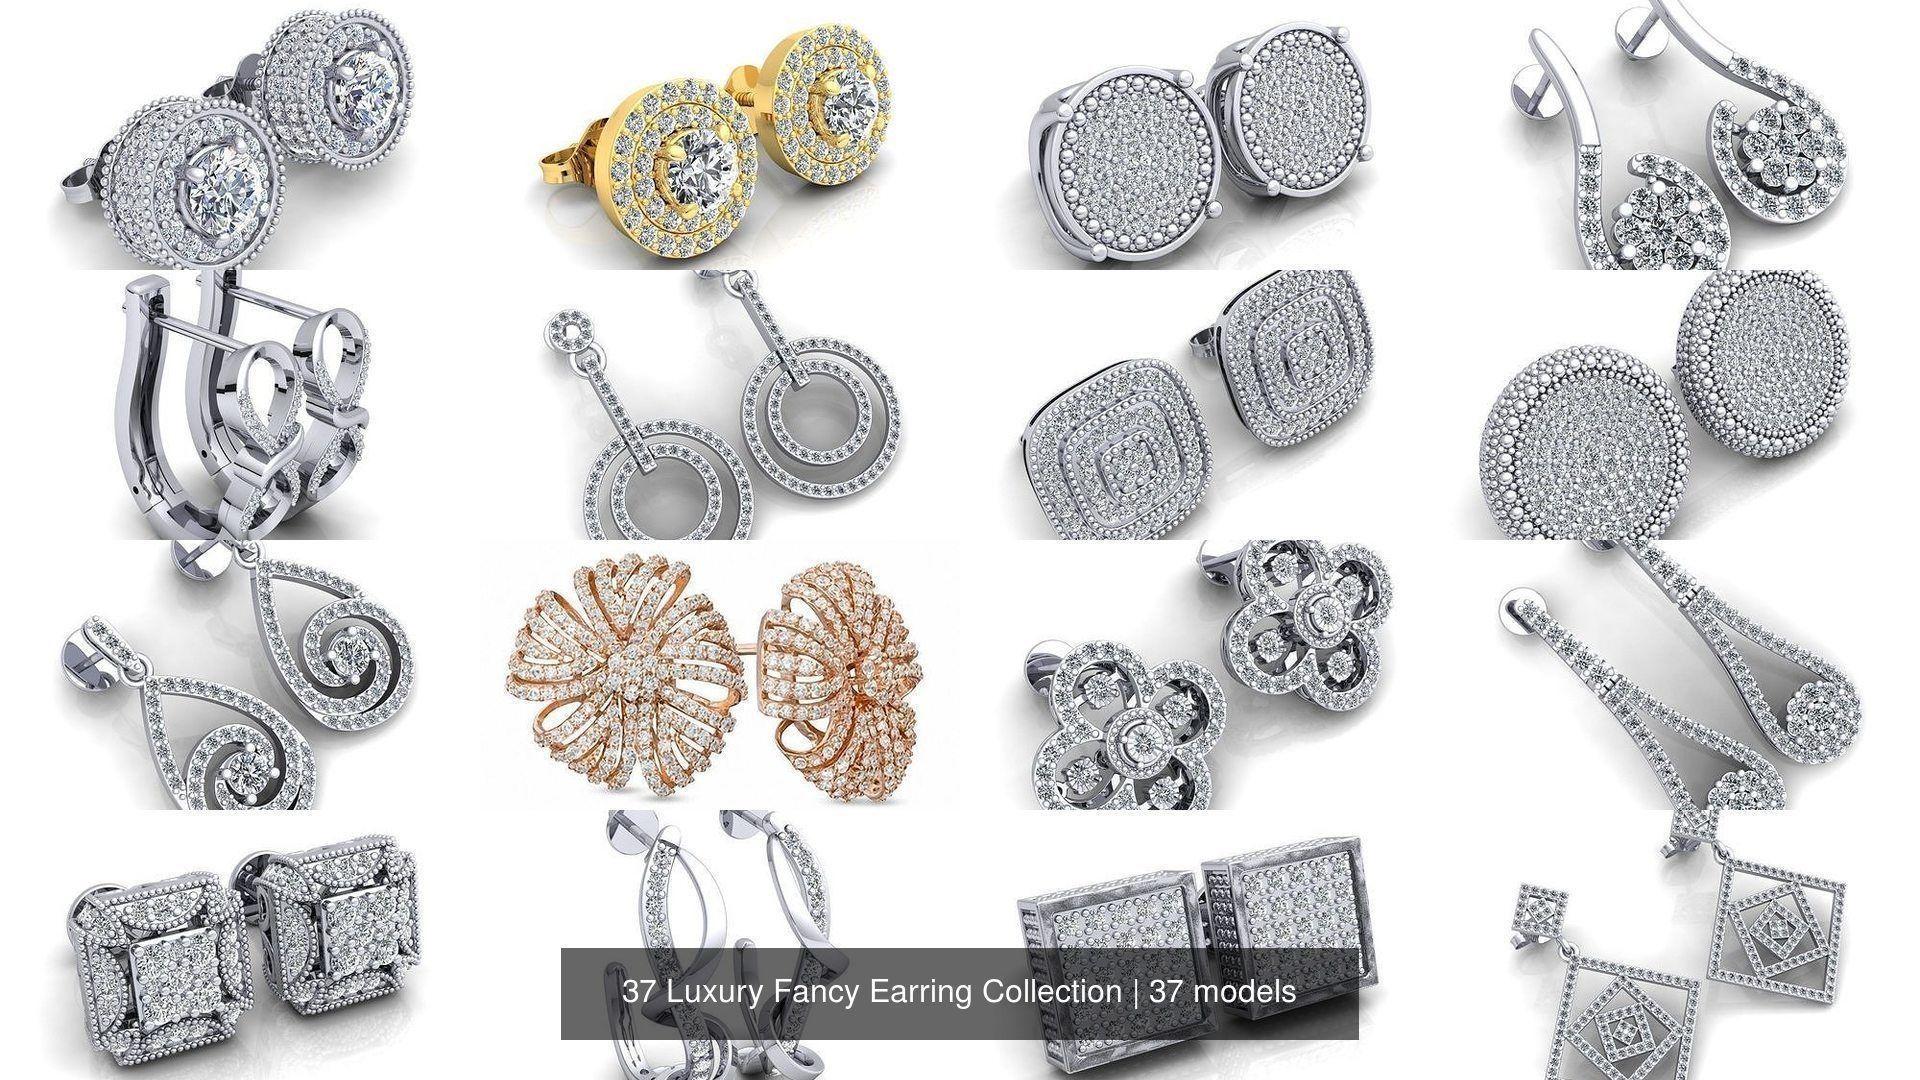 37 Luxury Fancy Earring Collection